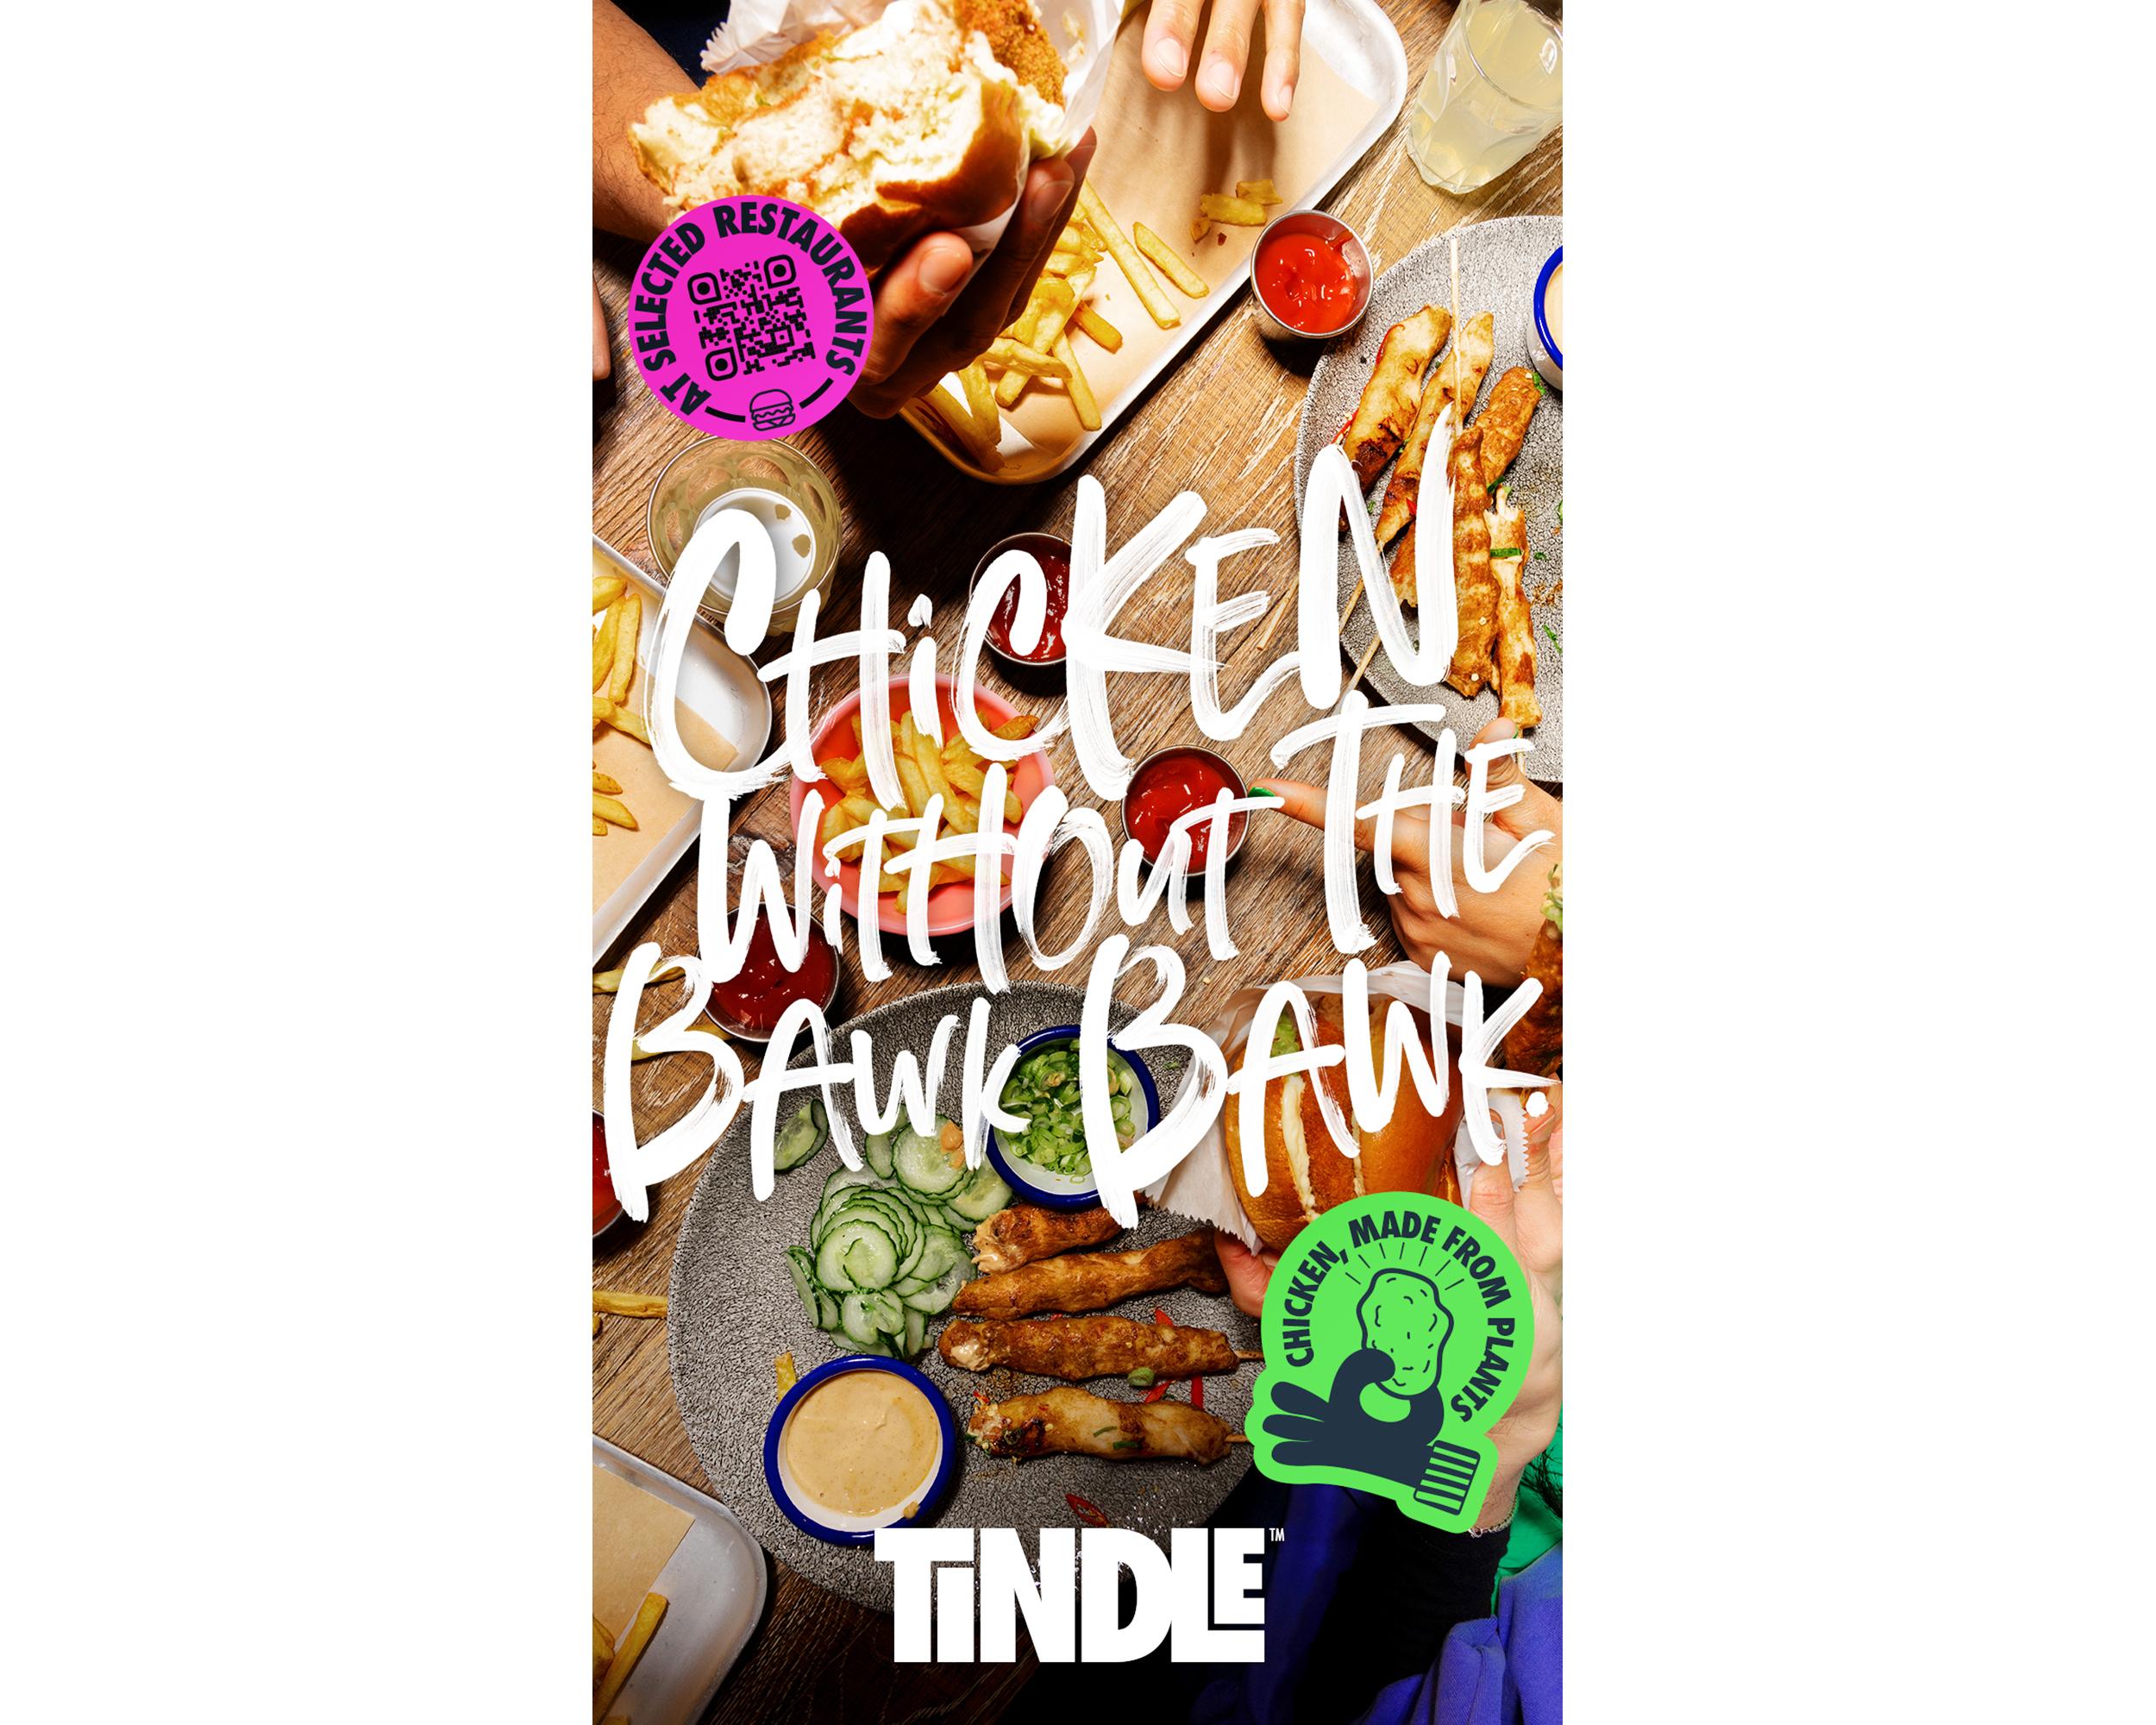 TiNDLE-Poster-1-BAWK-1